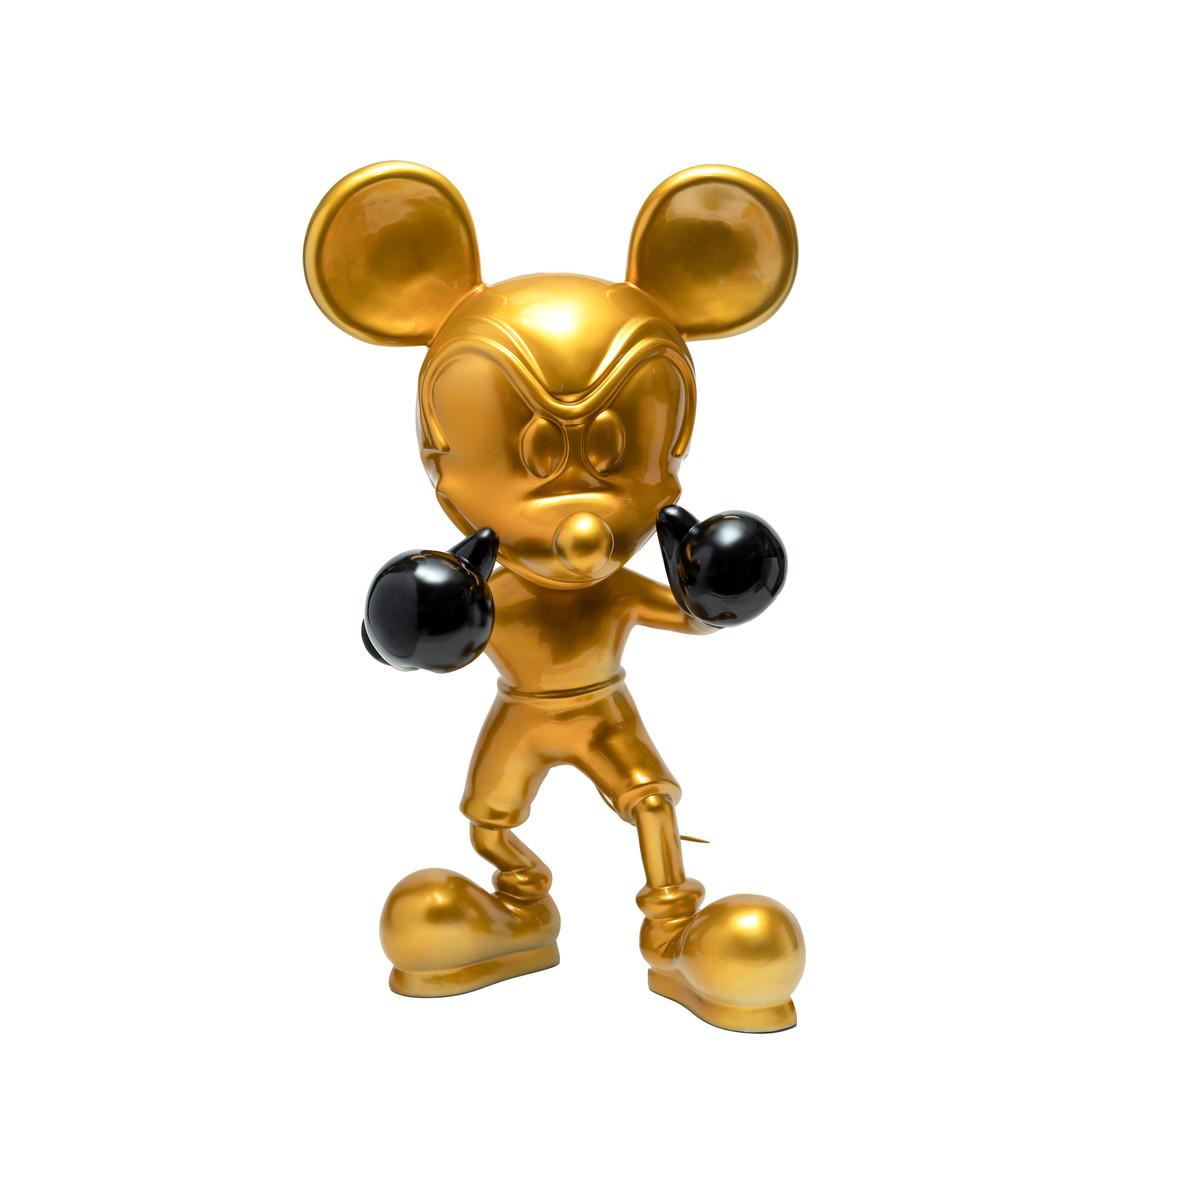 Knockout Mickey Gold by Sanuj Birla, Pop Art Sculpture | 3D, Fiber Glass,